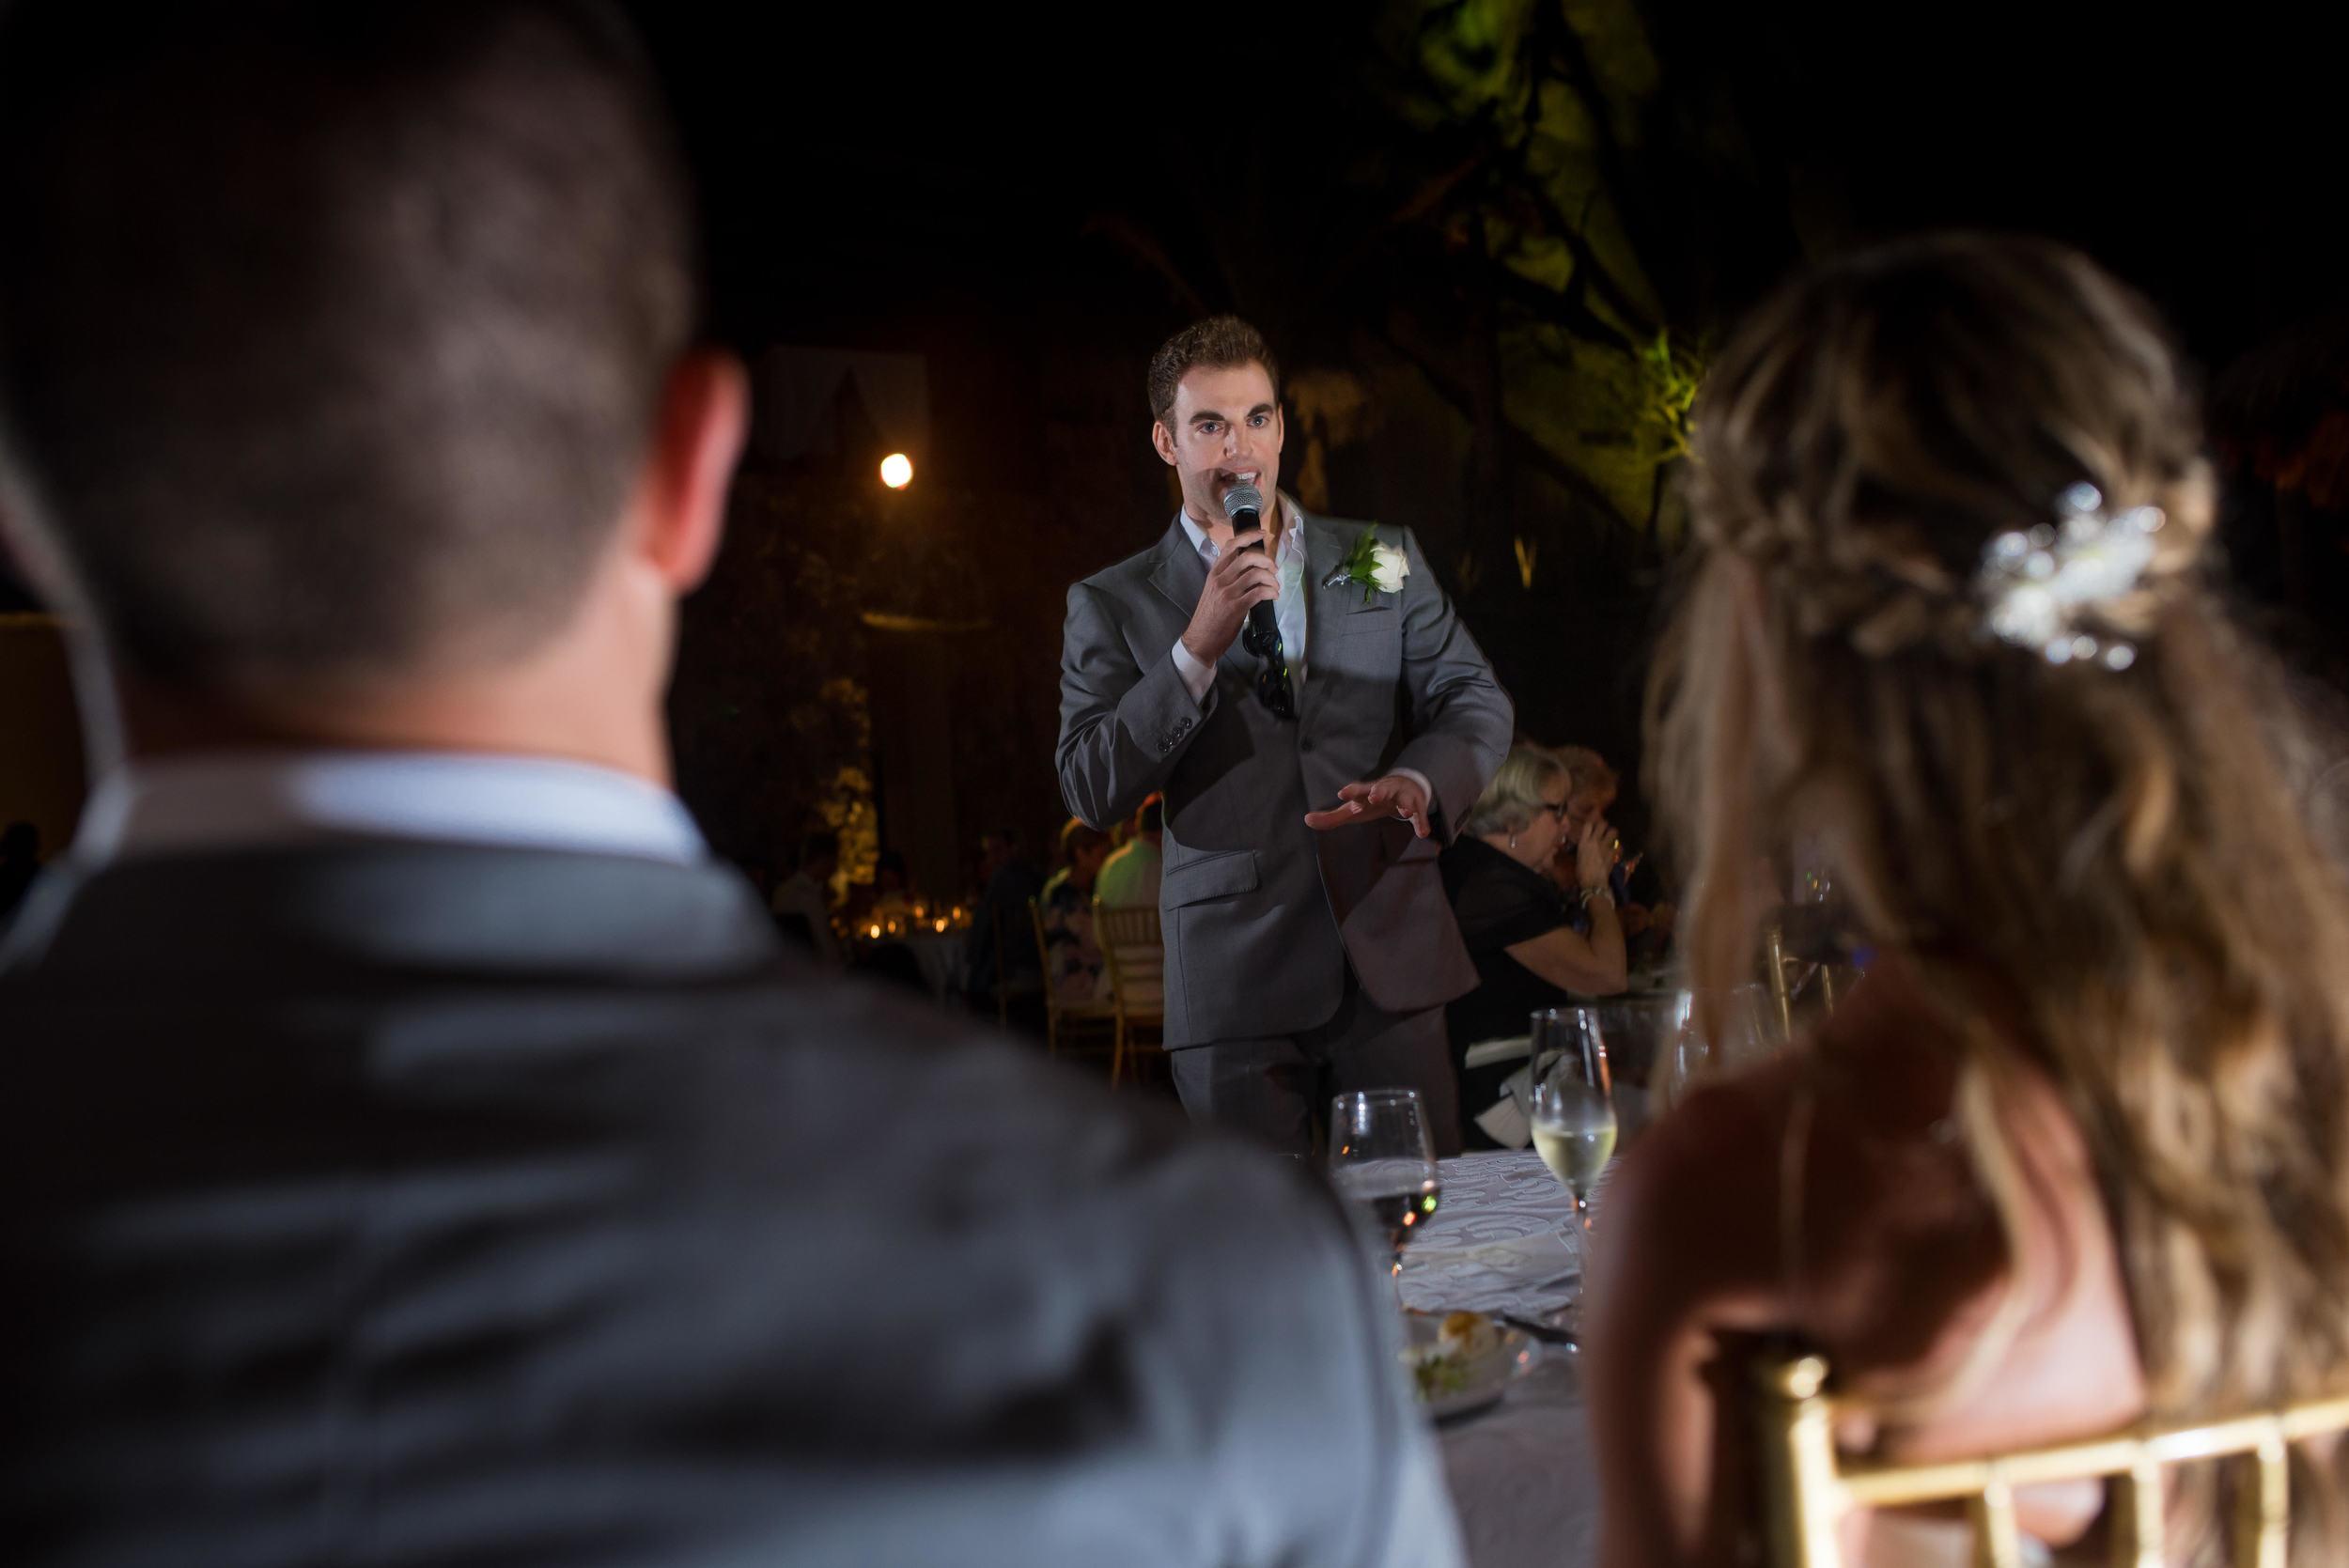 cabo wedding photographer-41.JPG